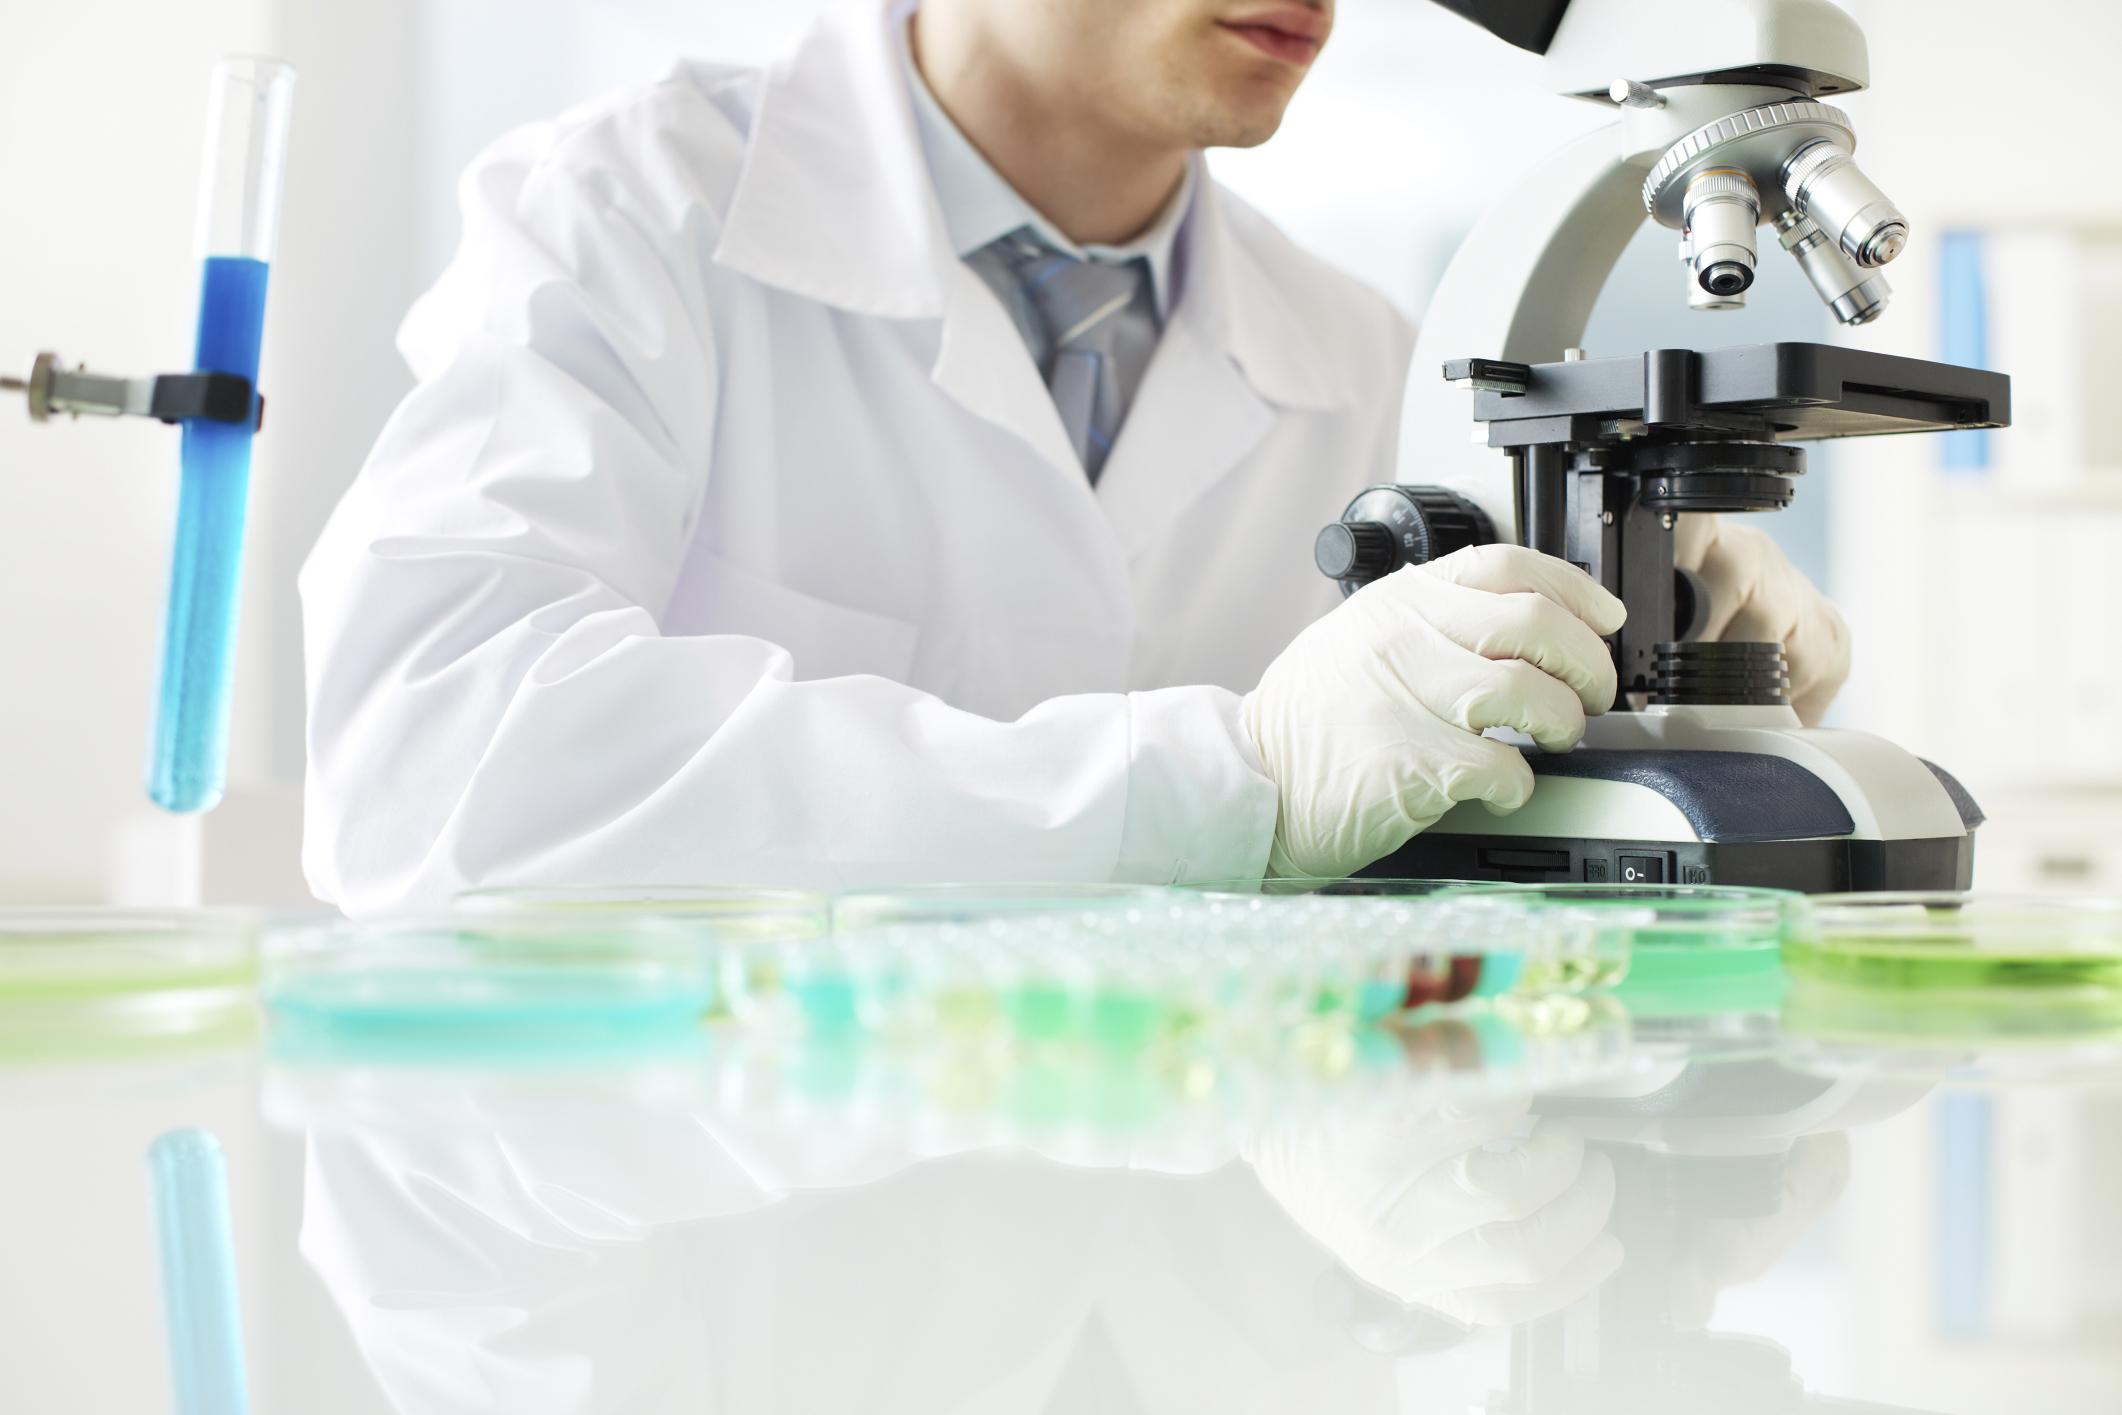 A biotech lab researcher using a microscope.